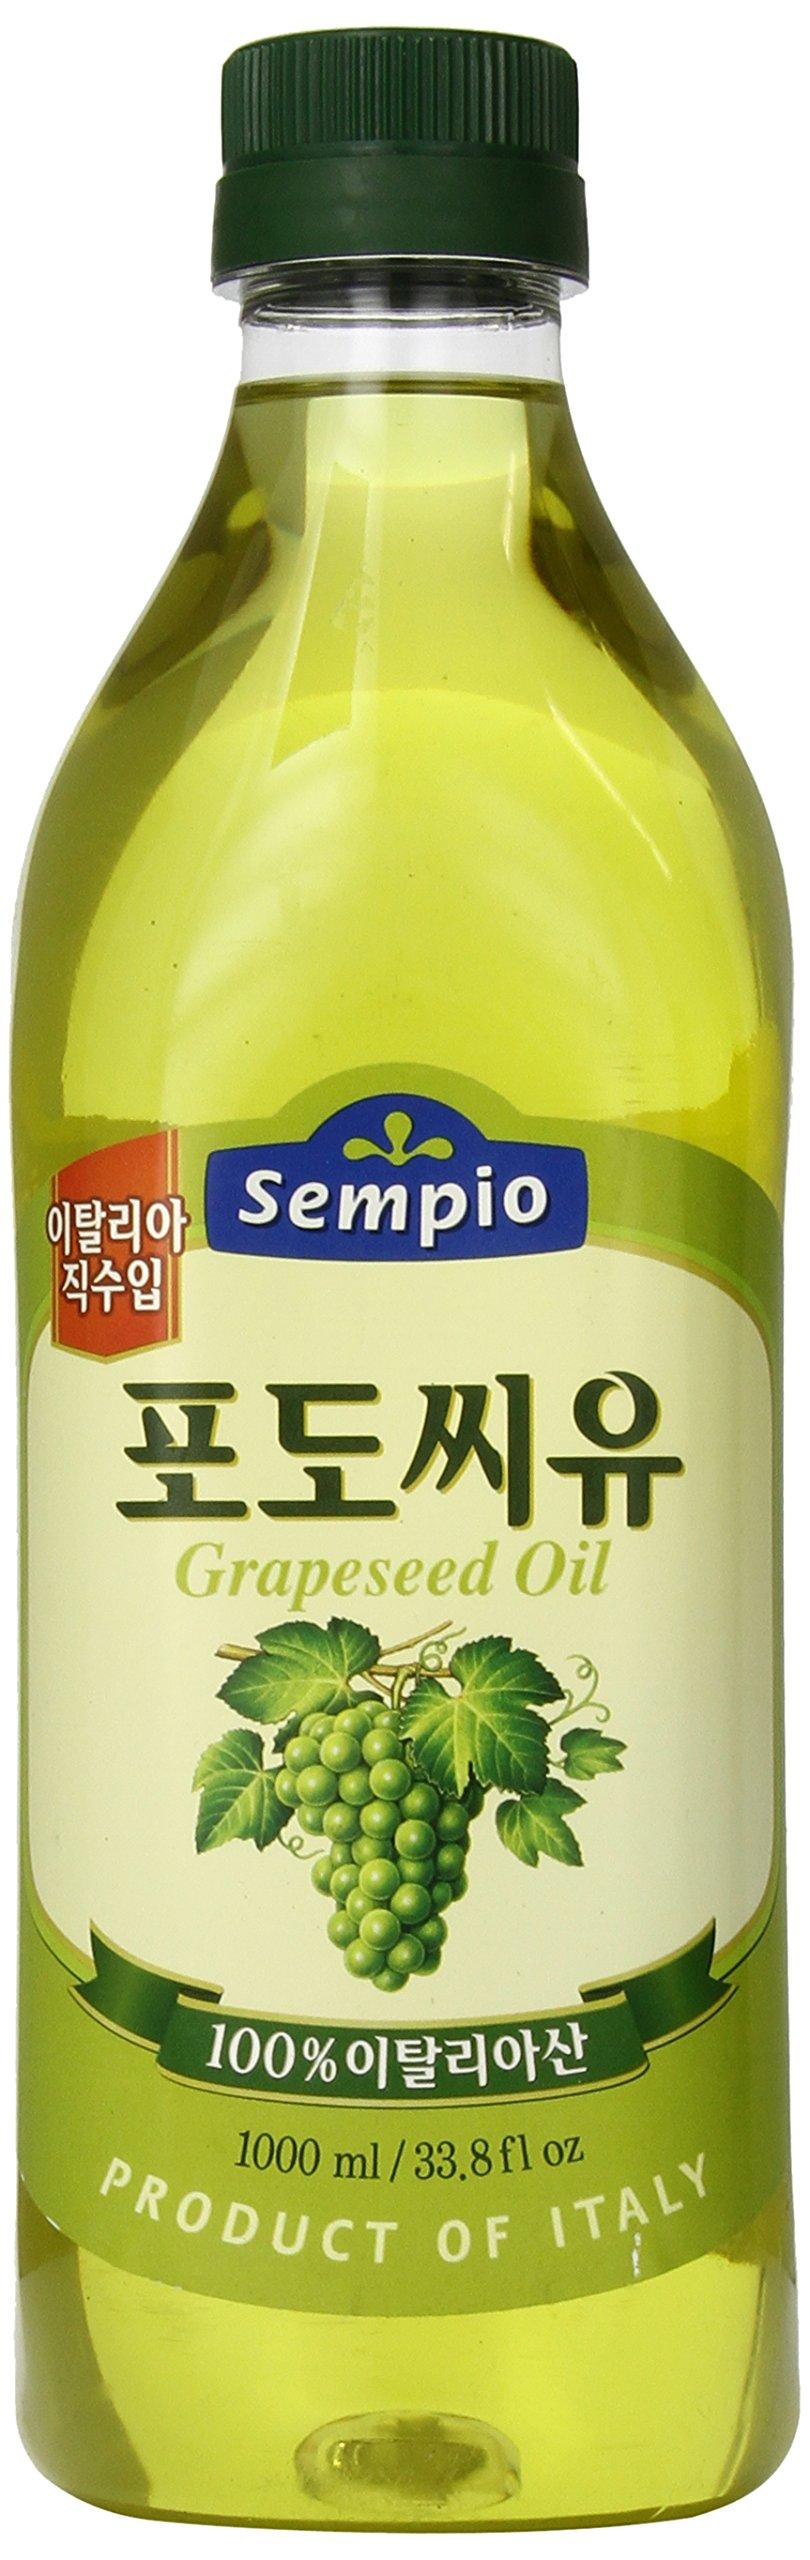 Sempio Grapeseed Oil, 33.81 Ounce